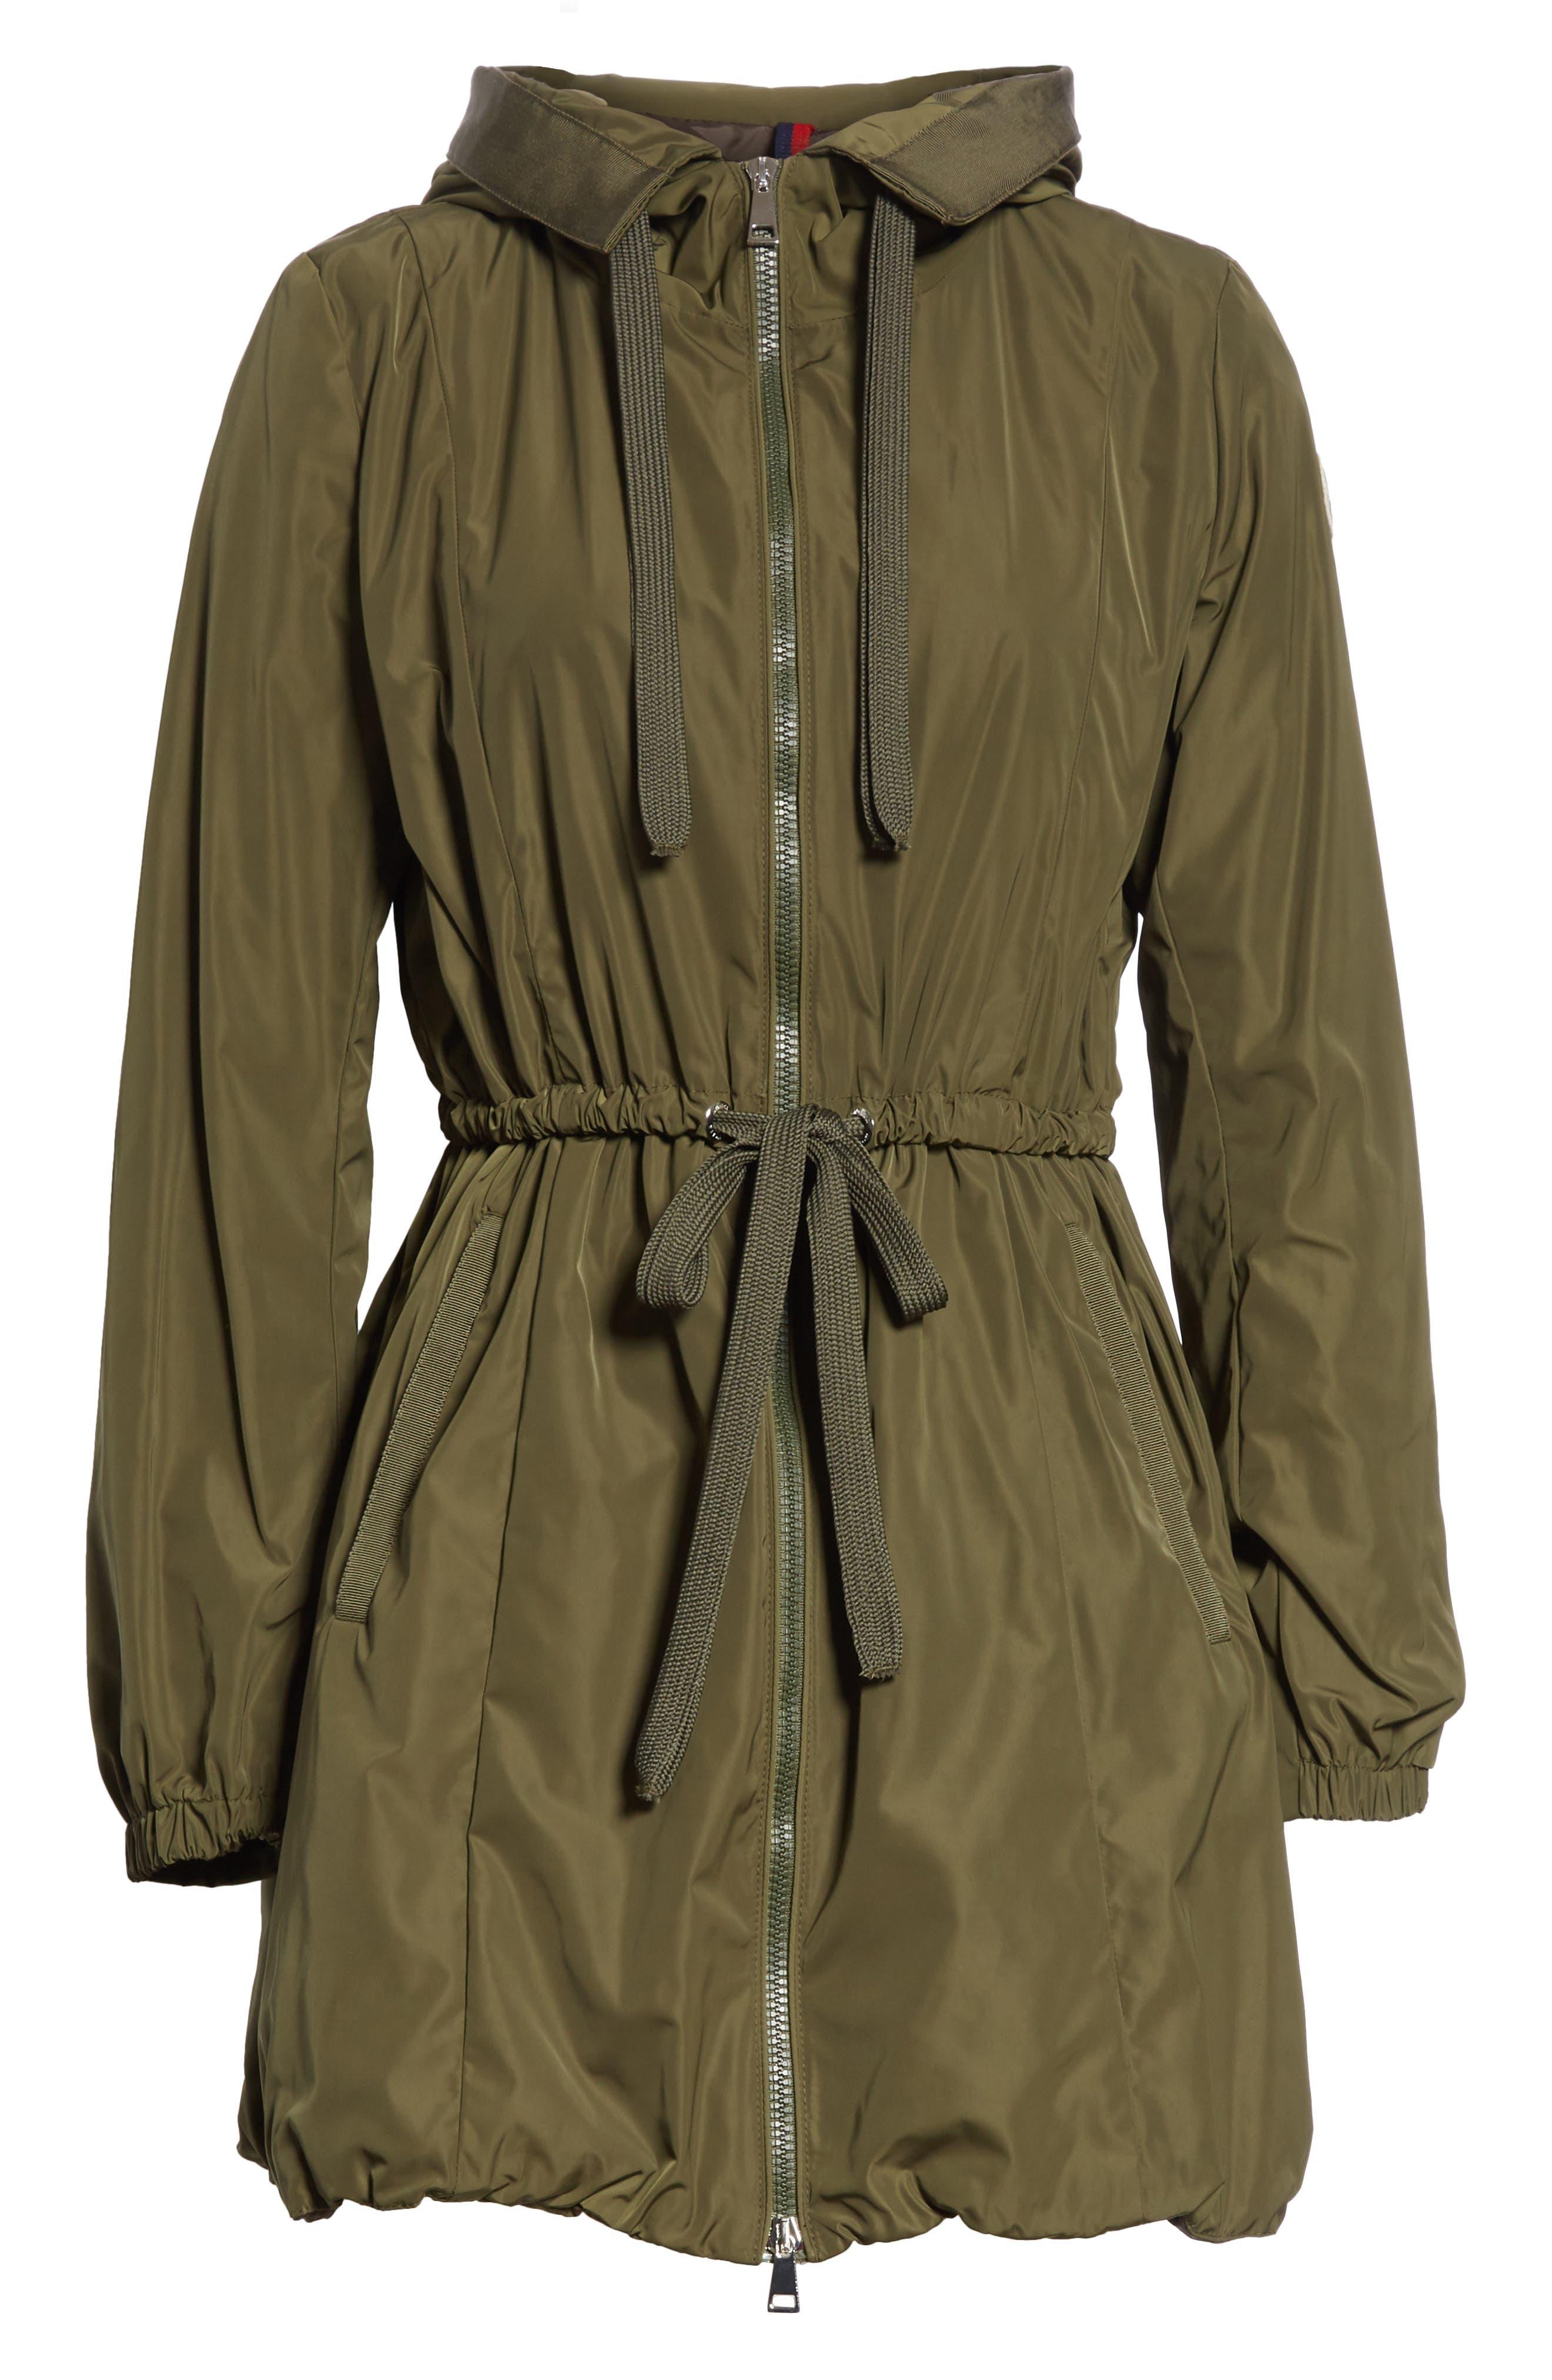 Topaze Water Resistant Hooded Jacket,                             Alternate thumbnail 6, color,                             Olive